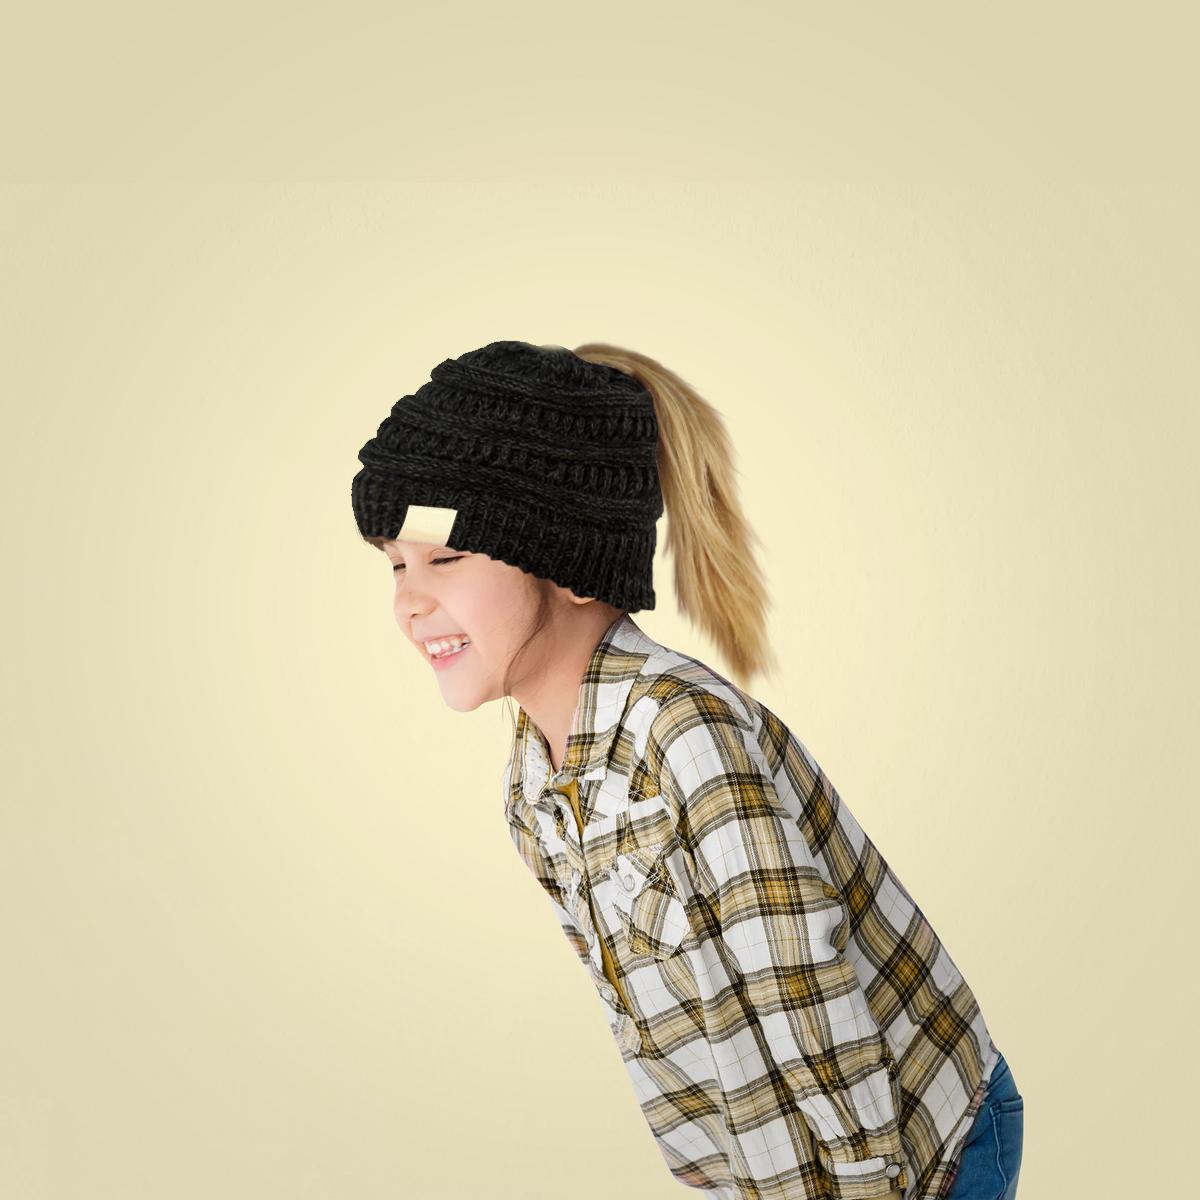 IAG-Girls-Ponytail-Beanie-Lifestyle-SKU102122-1200×1200